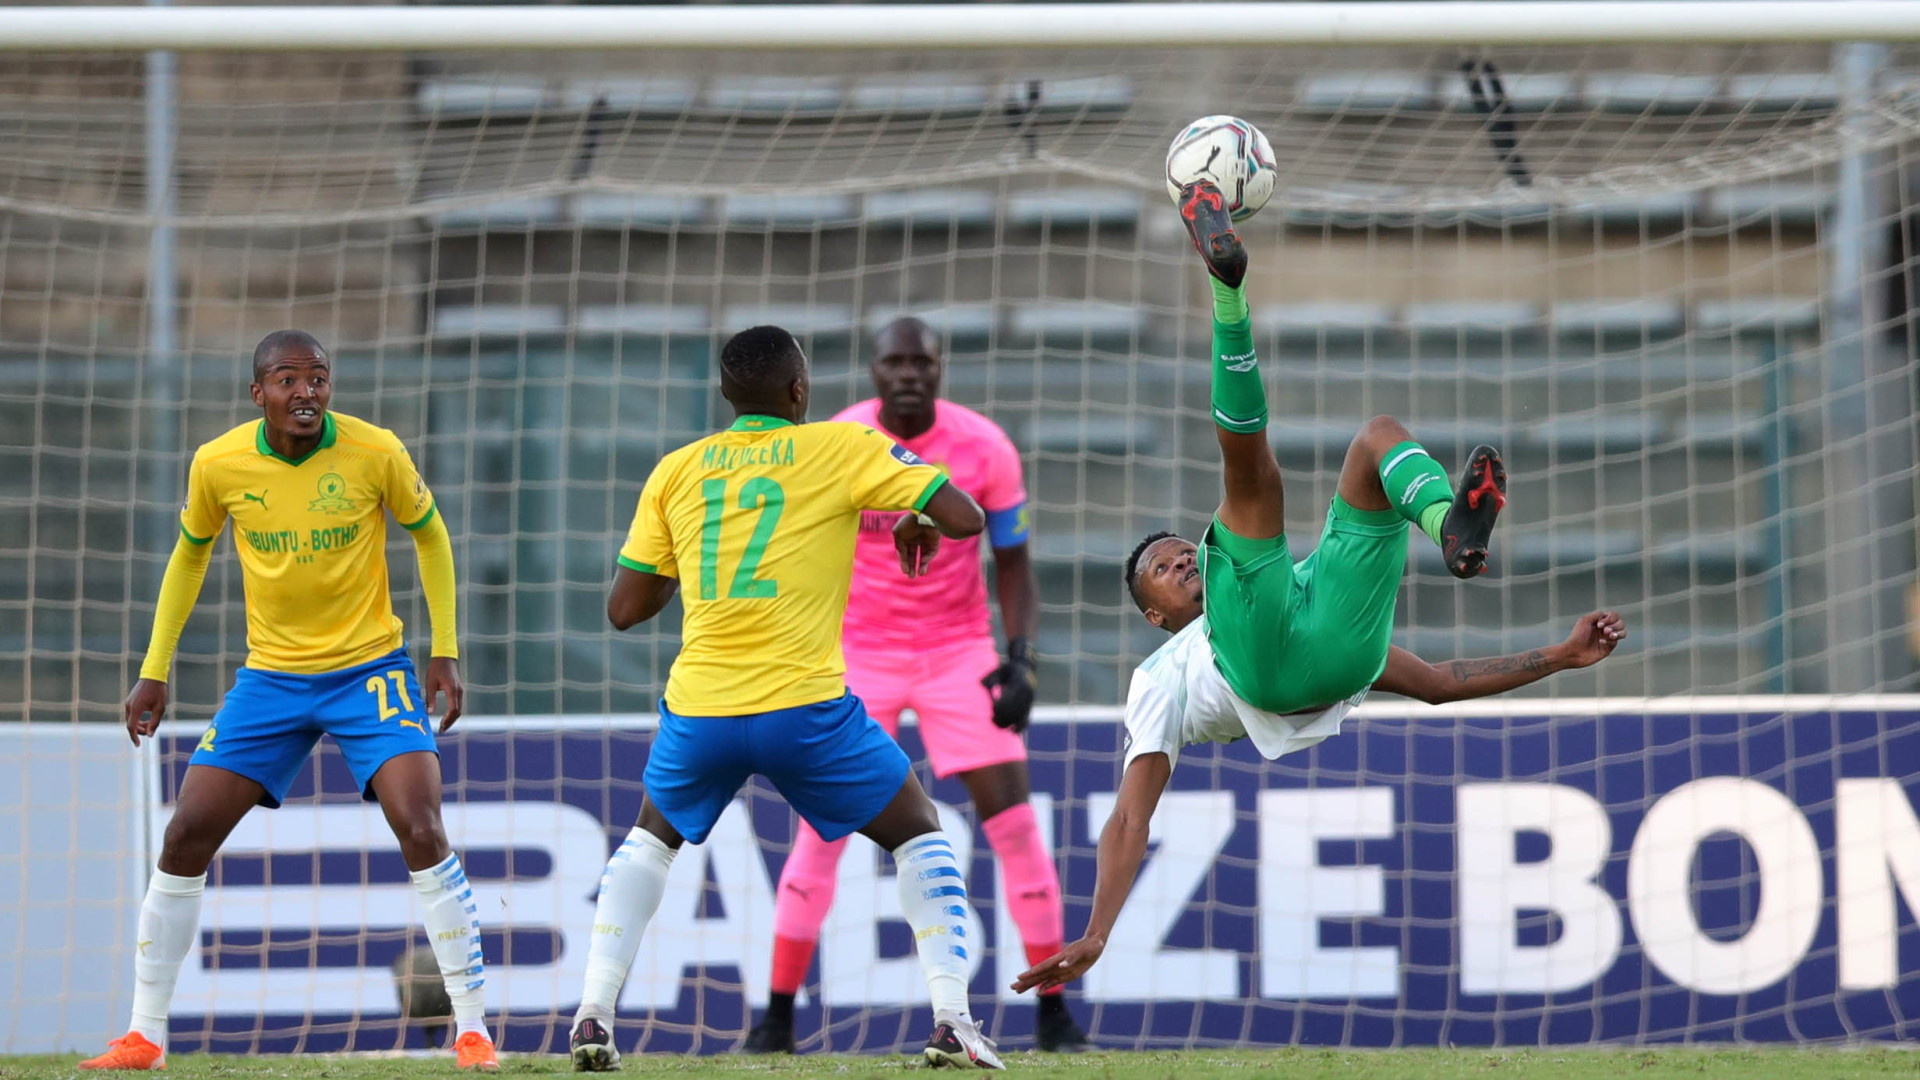 Mamelodi Sundowns 0-0 Bloemfontein Celtic: Masandawana frustrated by Siwelele and fail to win again